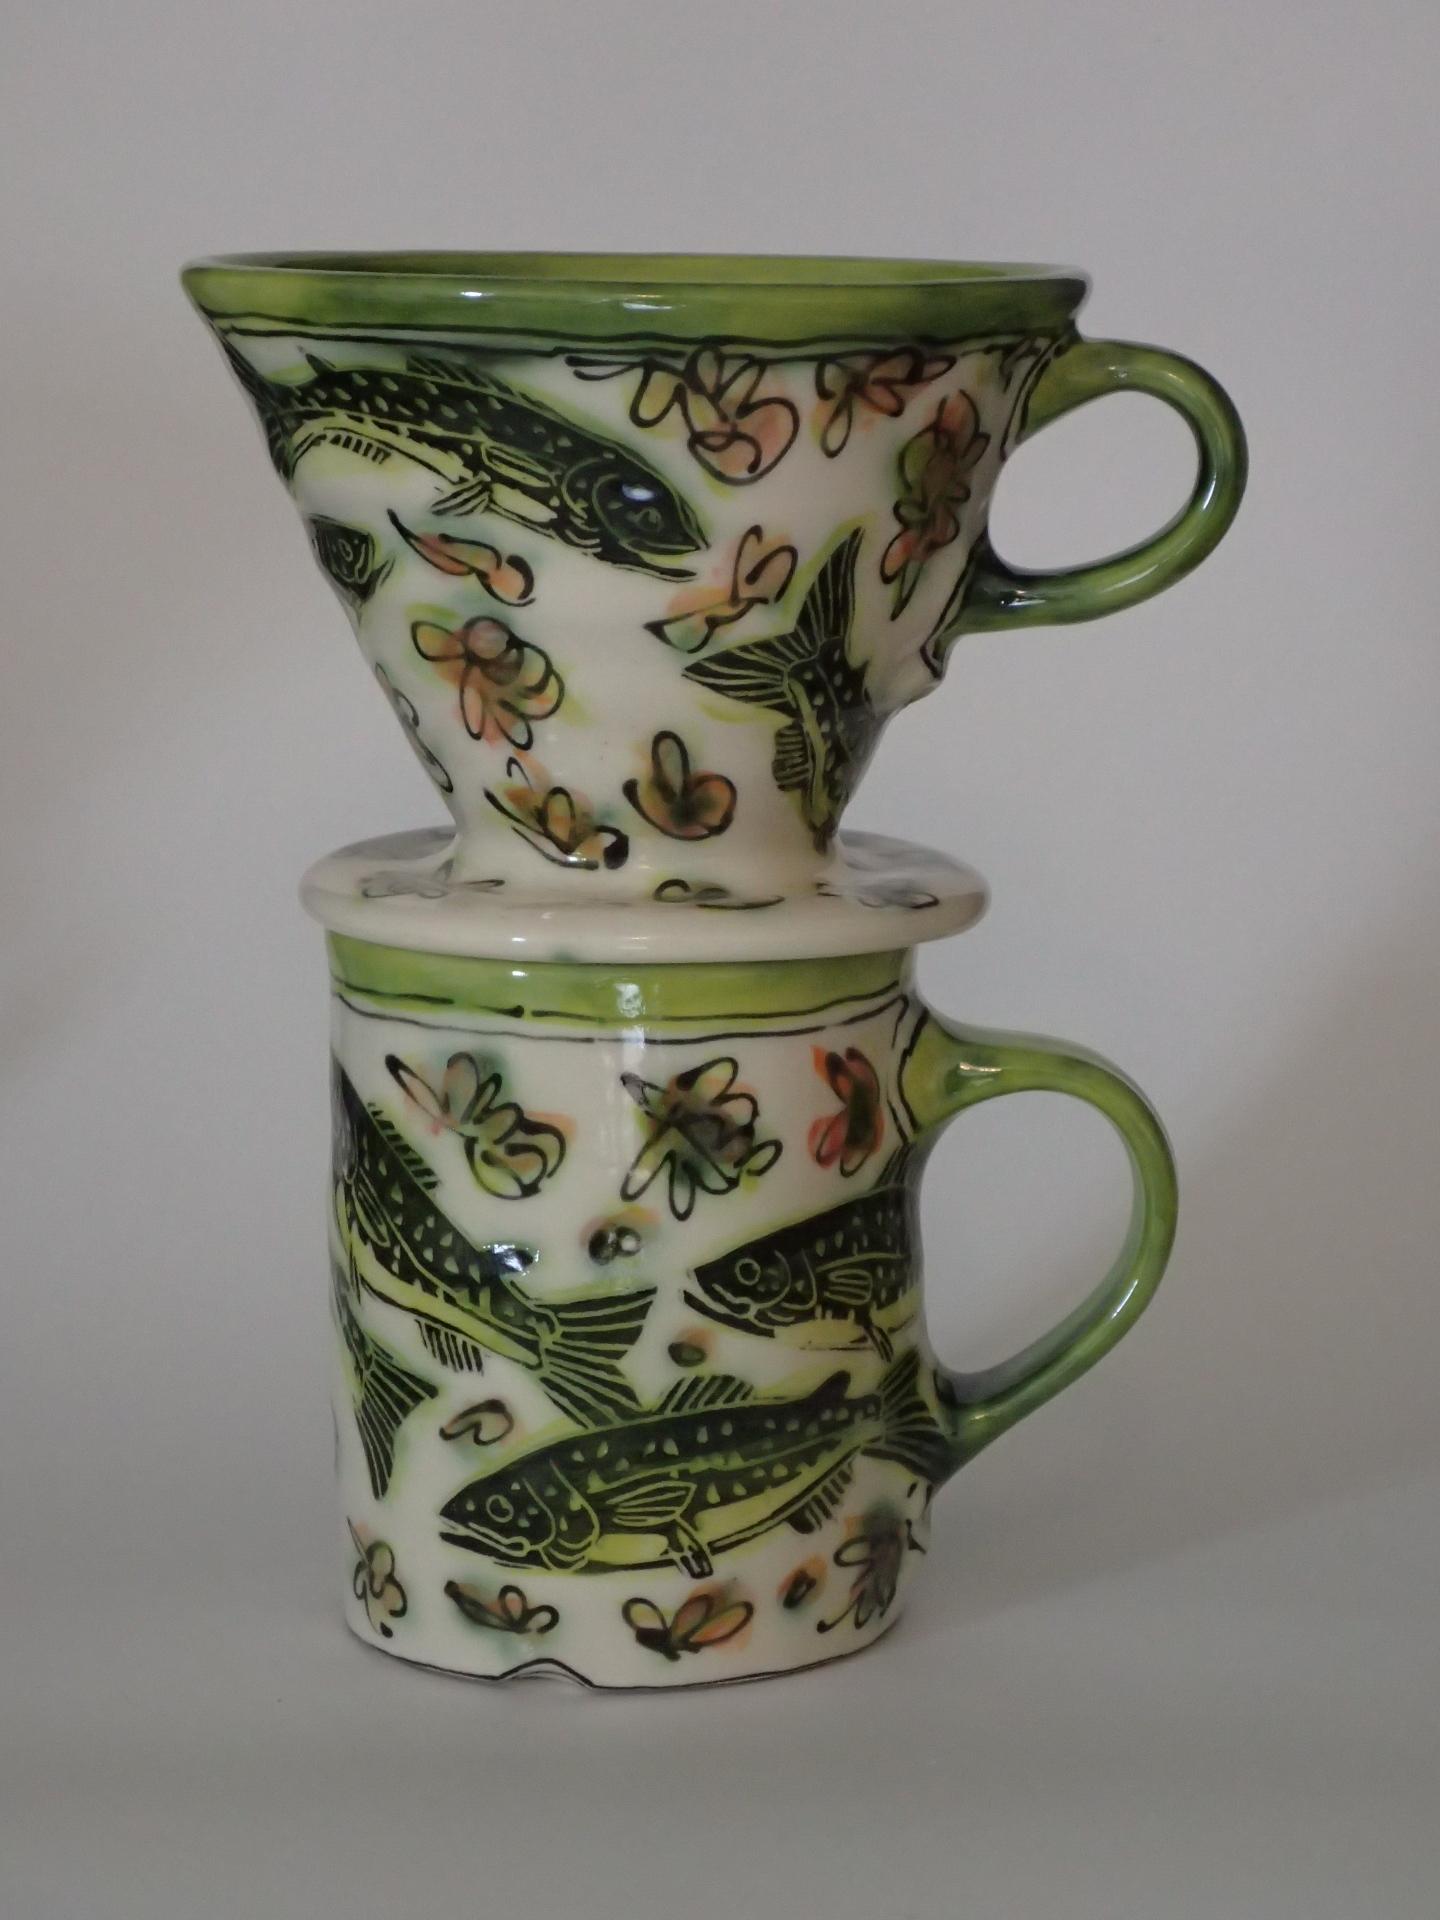 Fish Coffee Mug and Filter - Debra Kuzyk/Ray Mackie